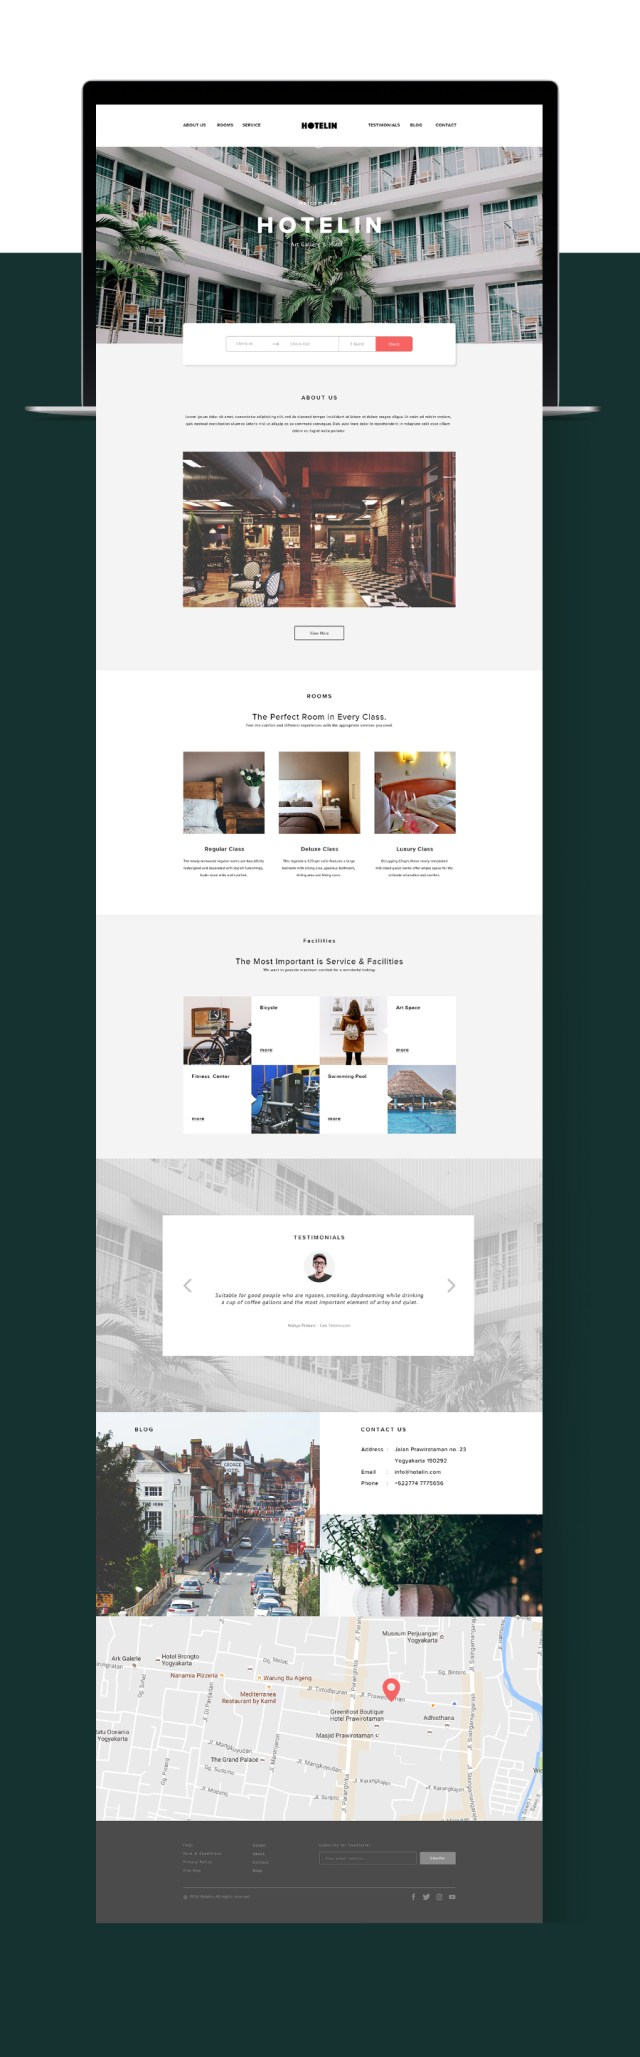 Hotelin Free PSD Website